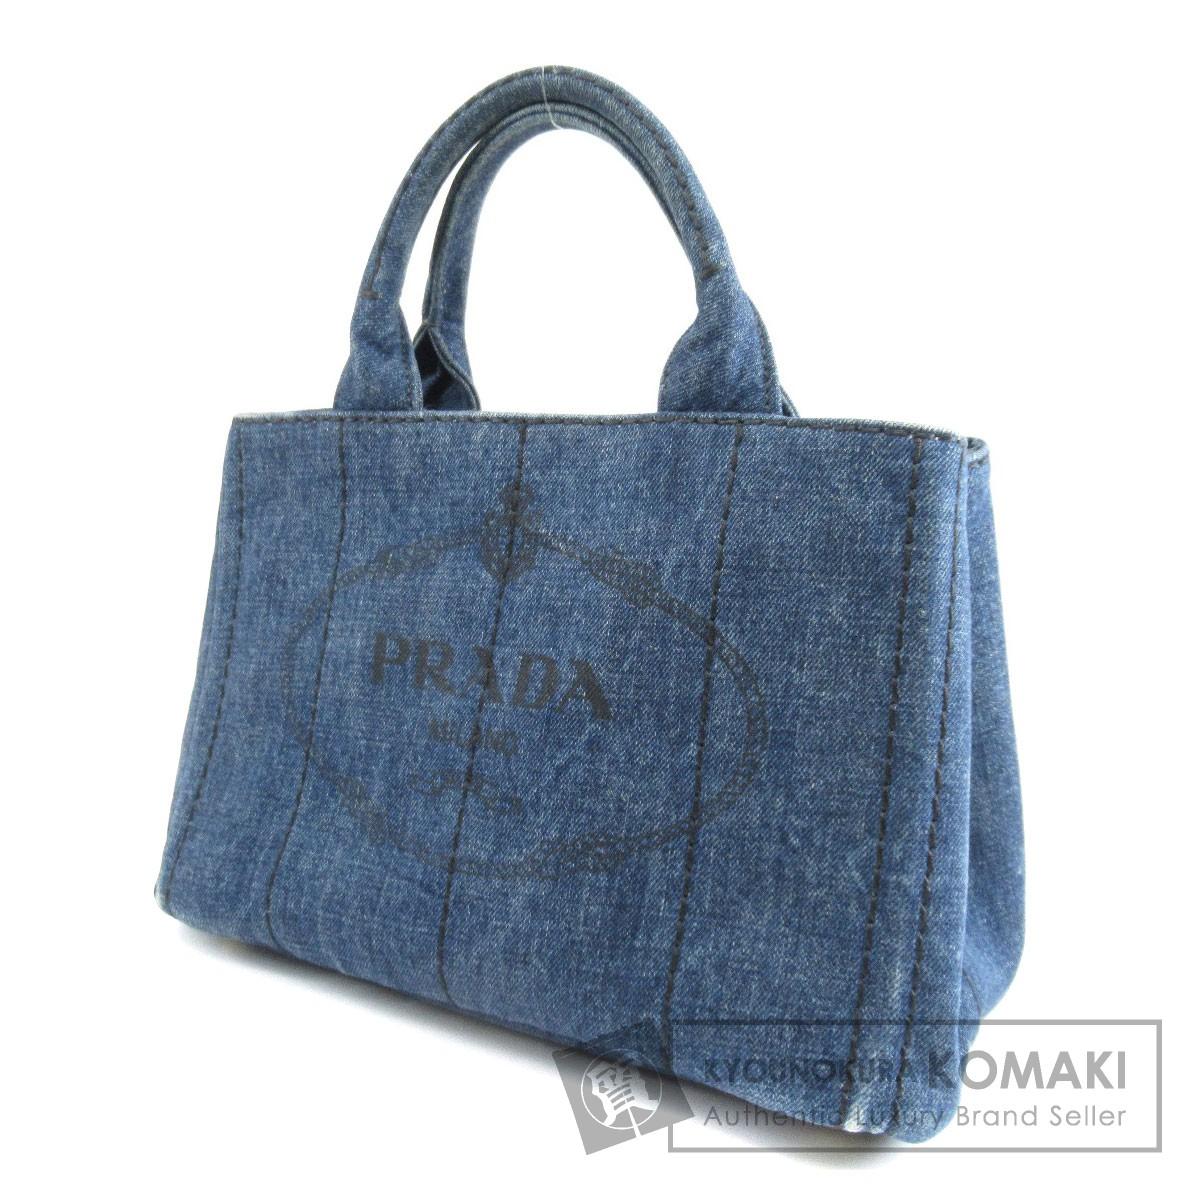 PRADA BN2439 カナパミニ ハンドバッグ キャンバス レディース 【中古】【プラダ】